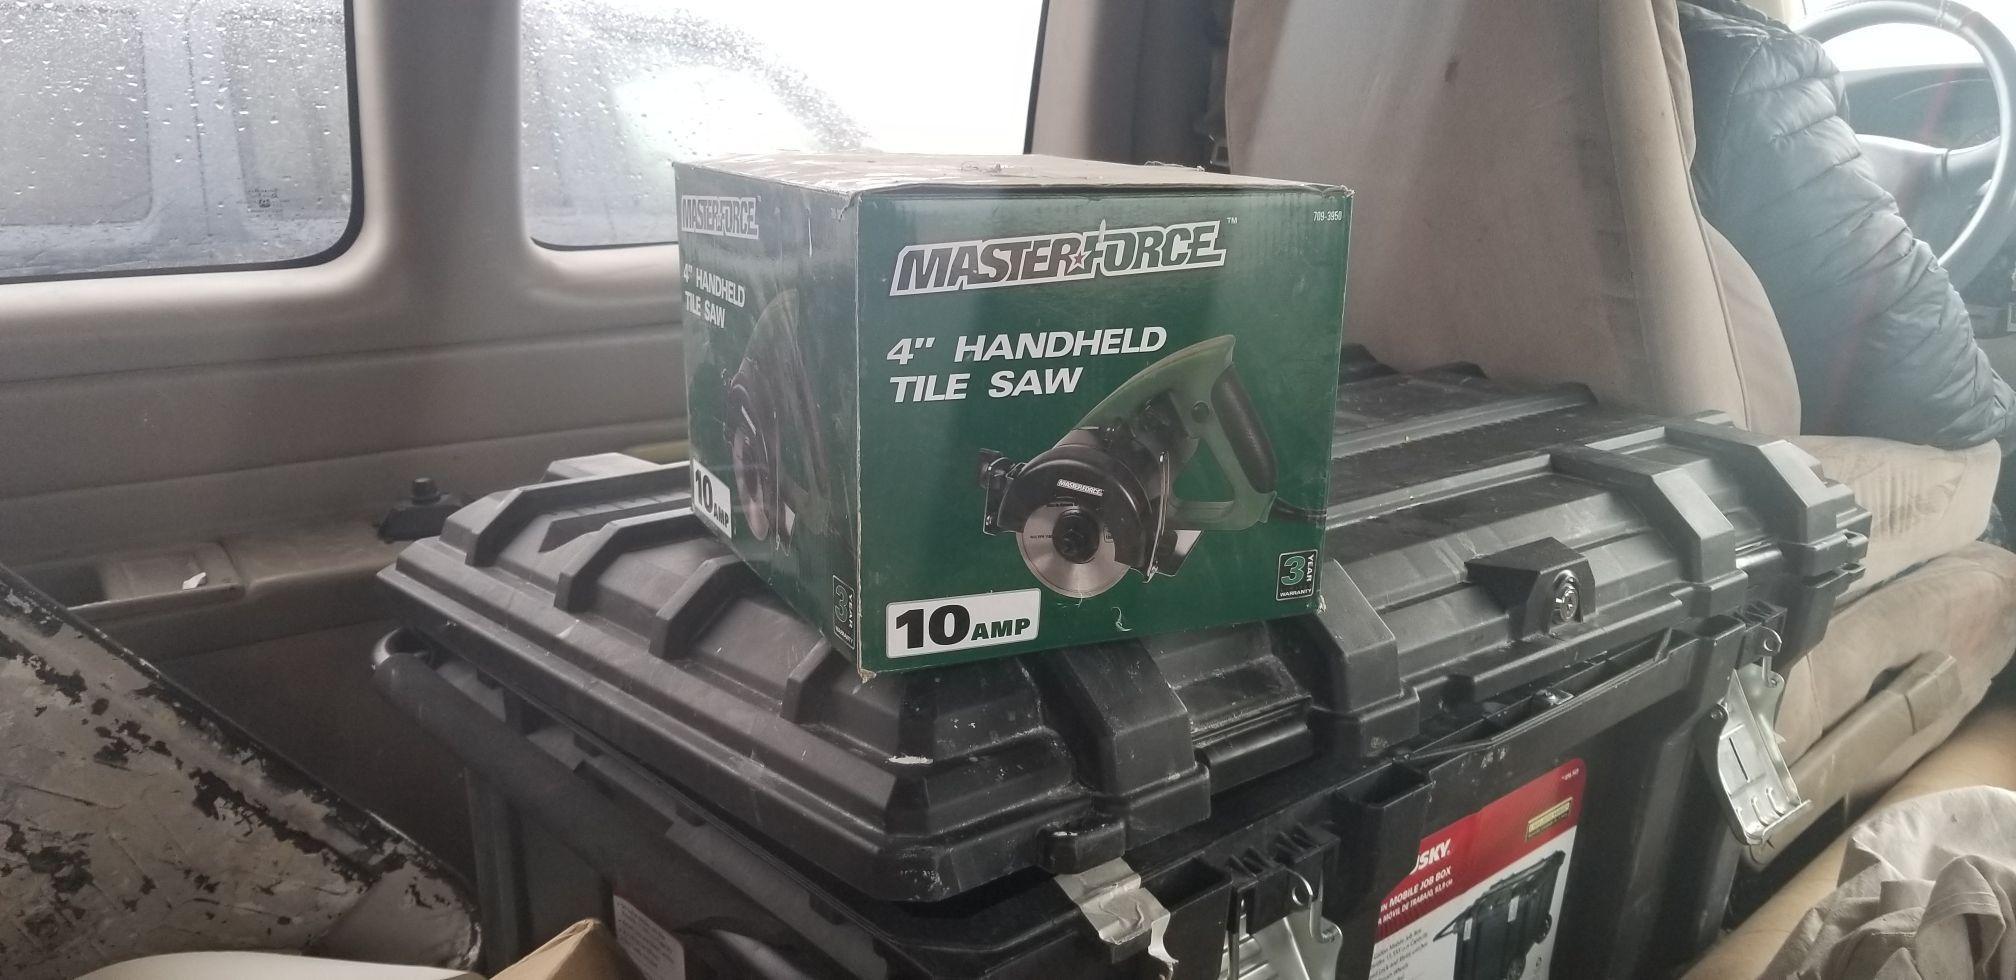 Handheld tile saw